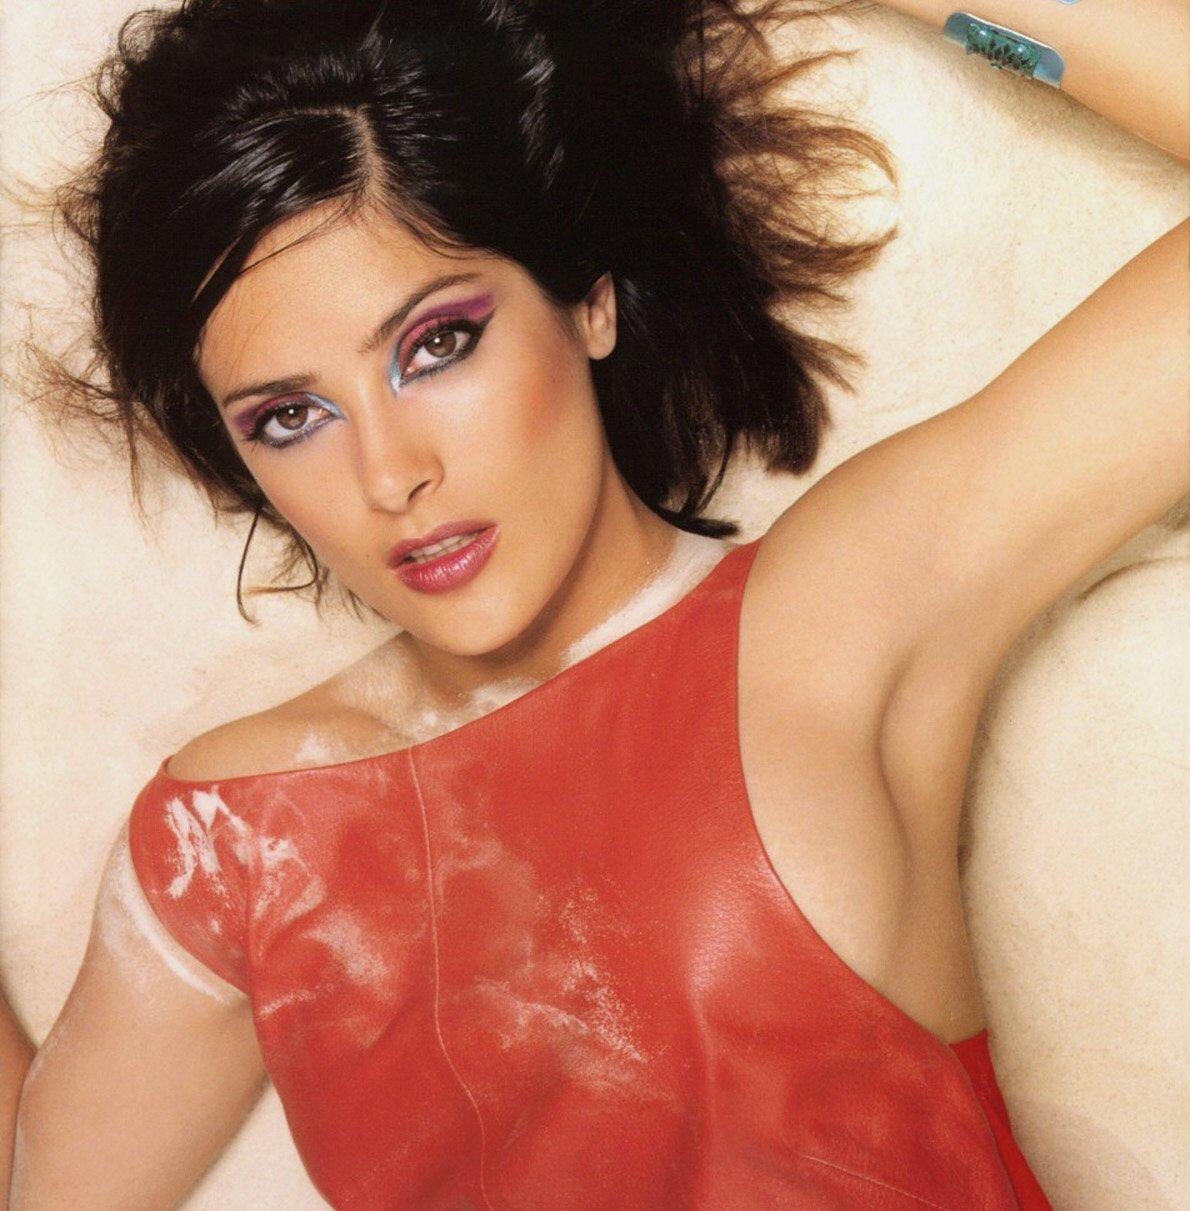 Erotic kissing hollywood actress clips